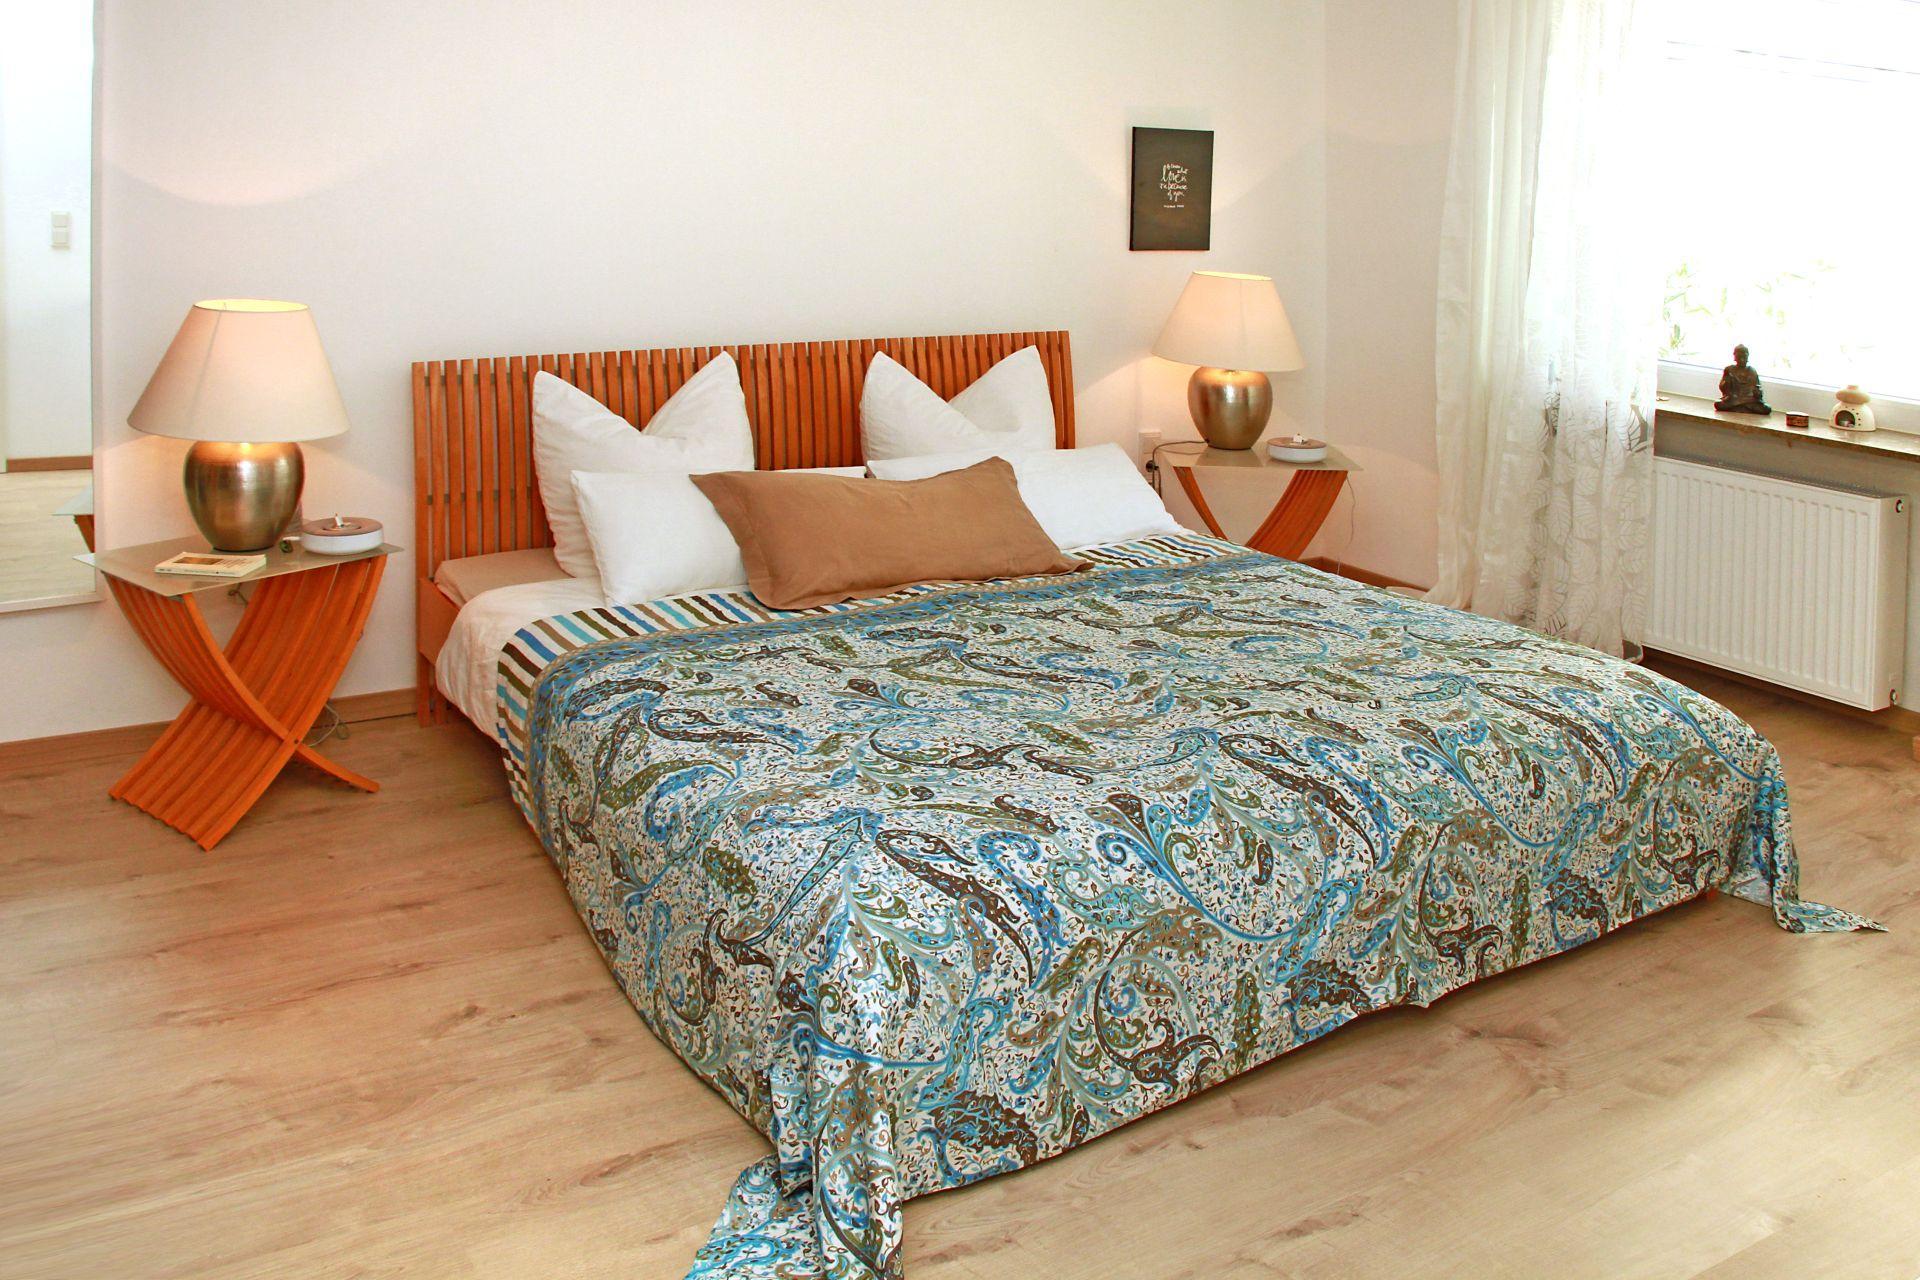 Neues Schlafzimmer #bett ©Petra Karin Hartz • COUCH